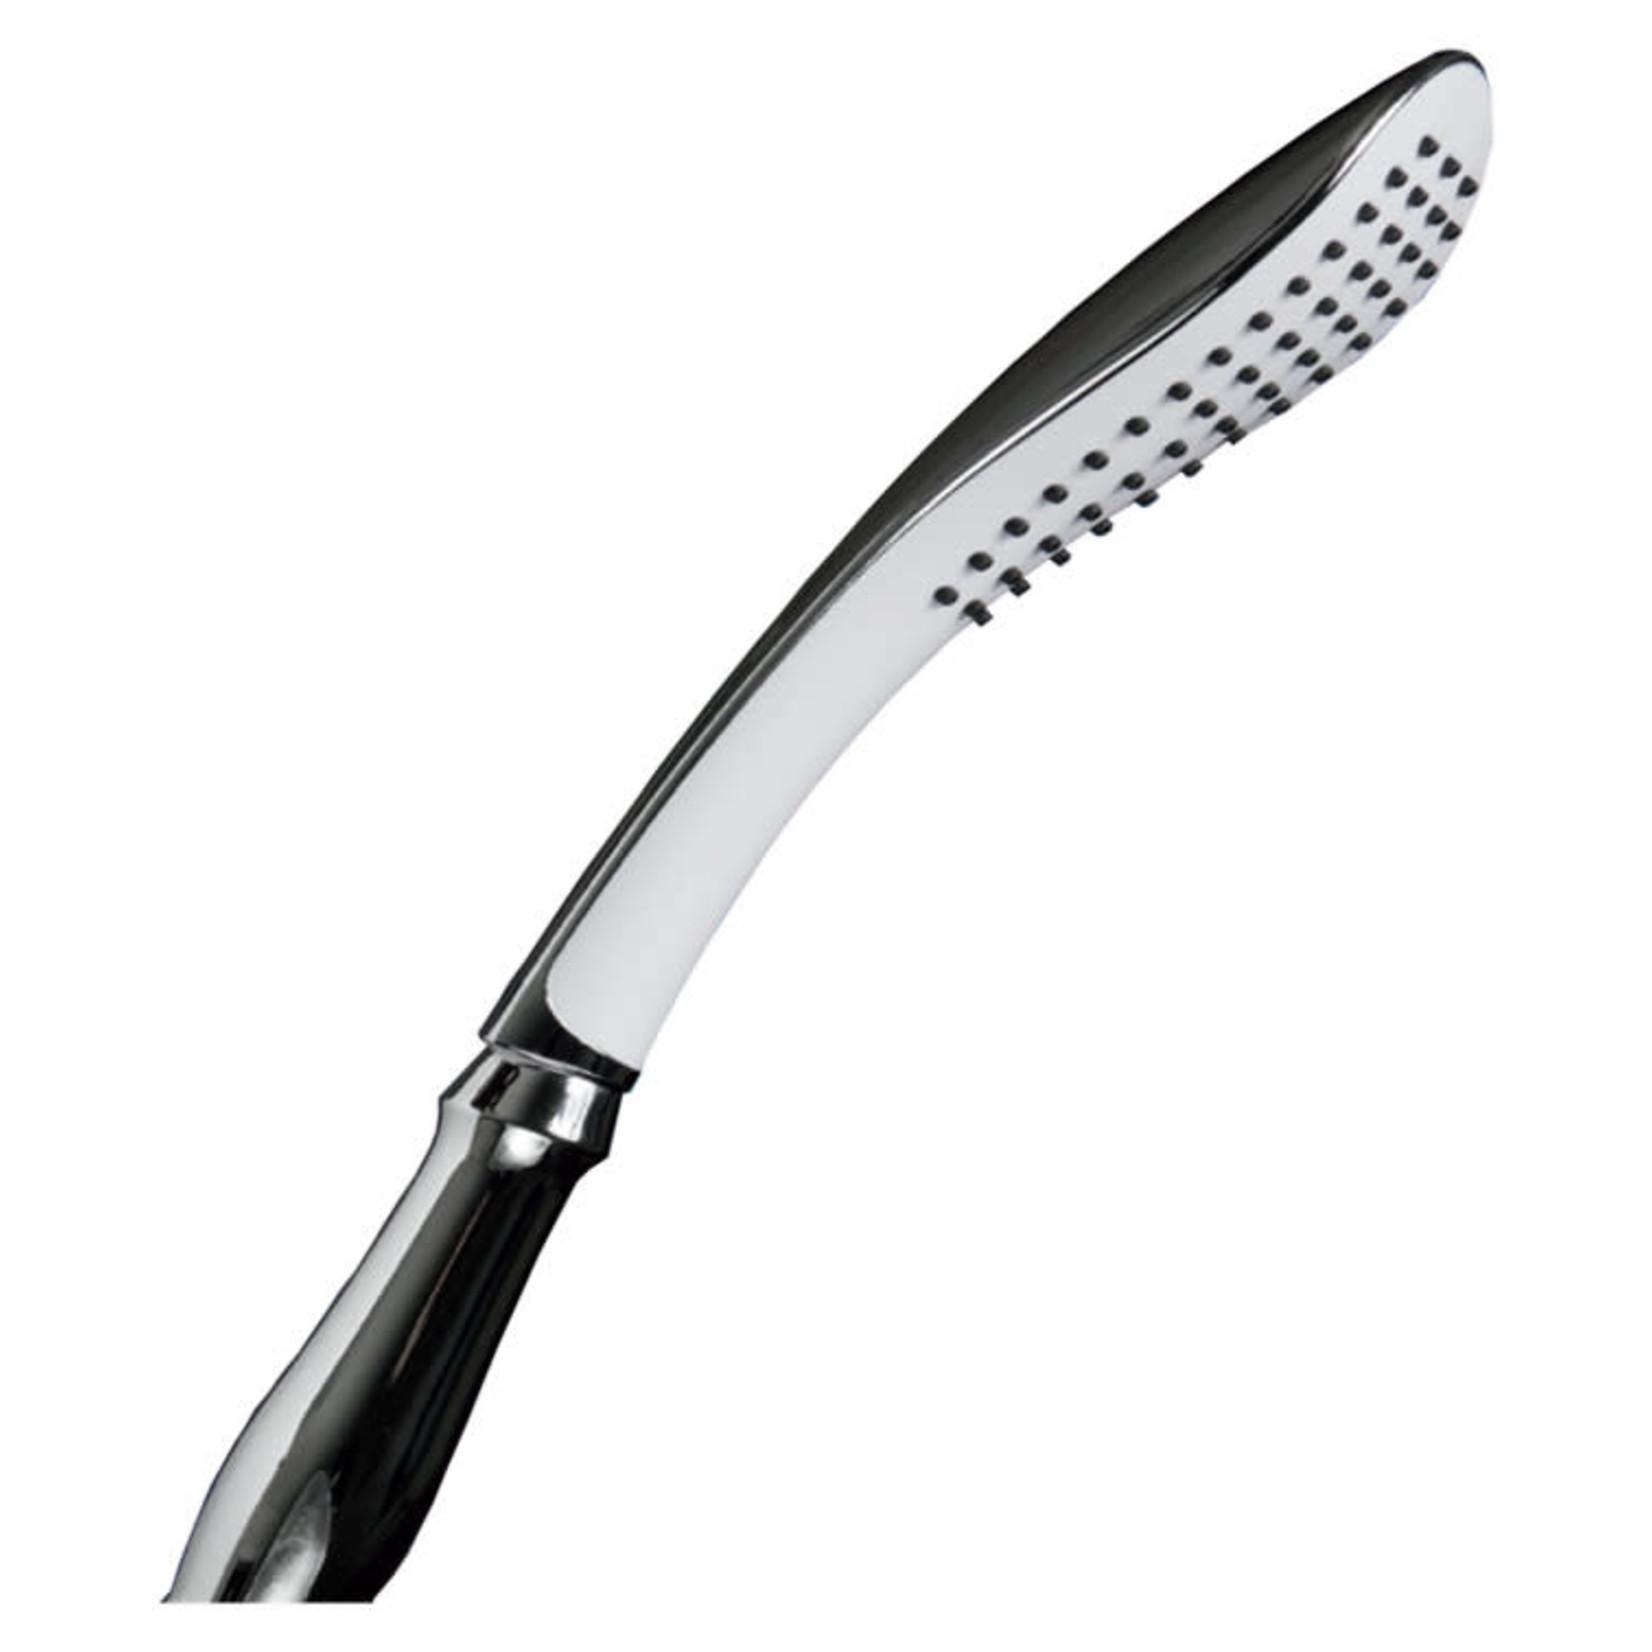 MOBB Shower wand, Adjustable